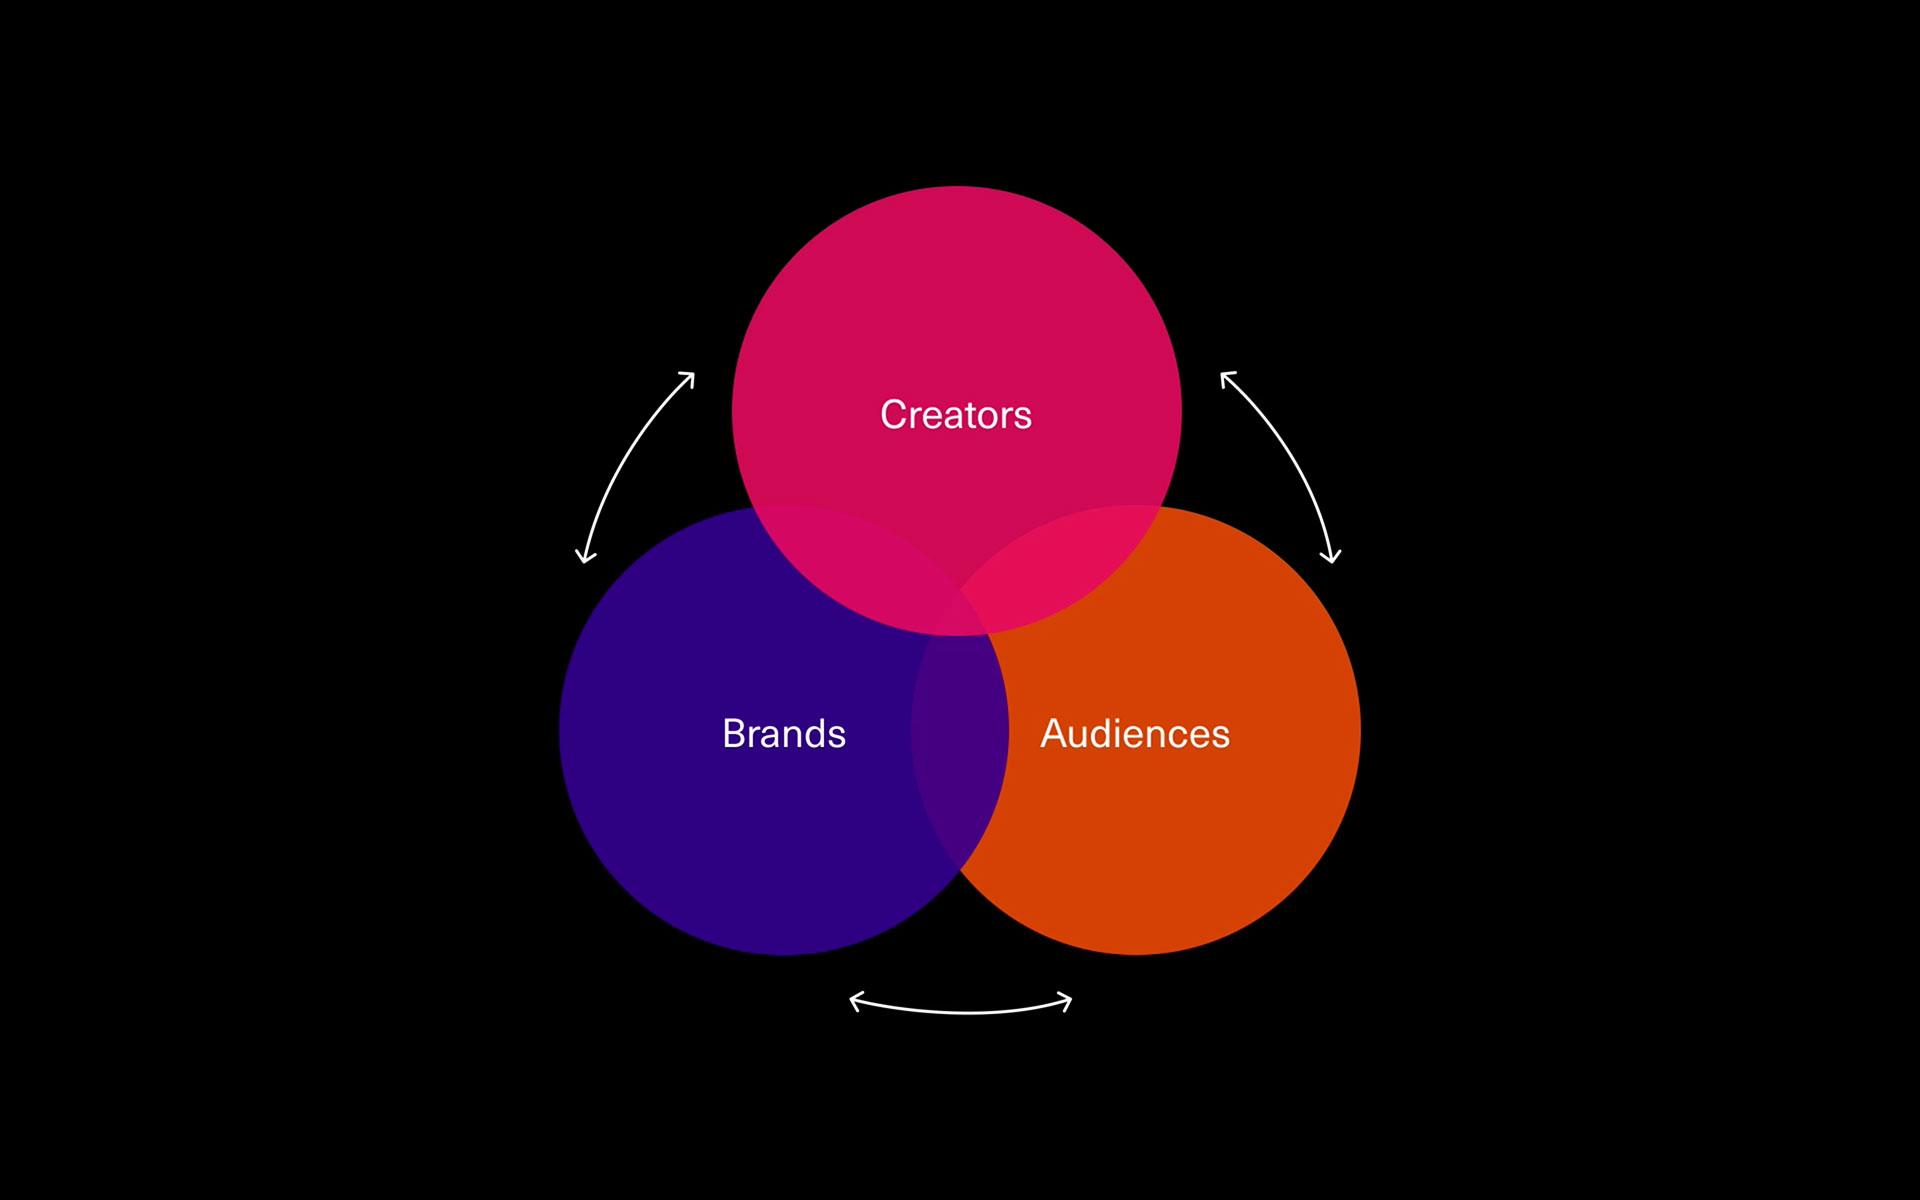 Jerrick to Creatd 2020 Presentation